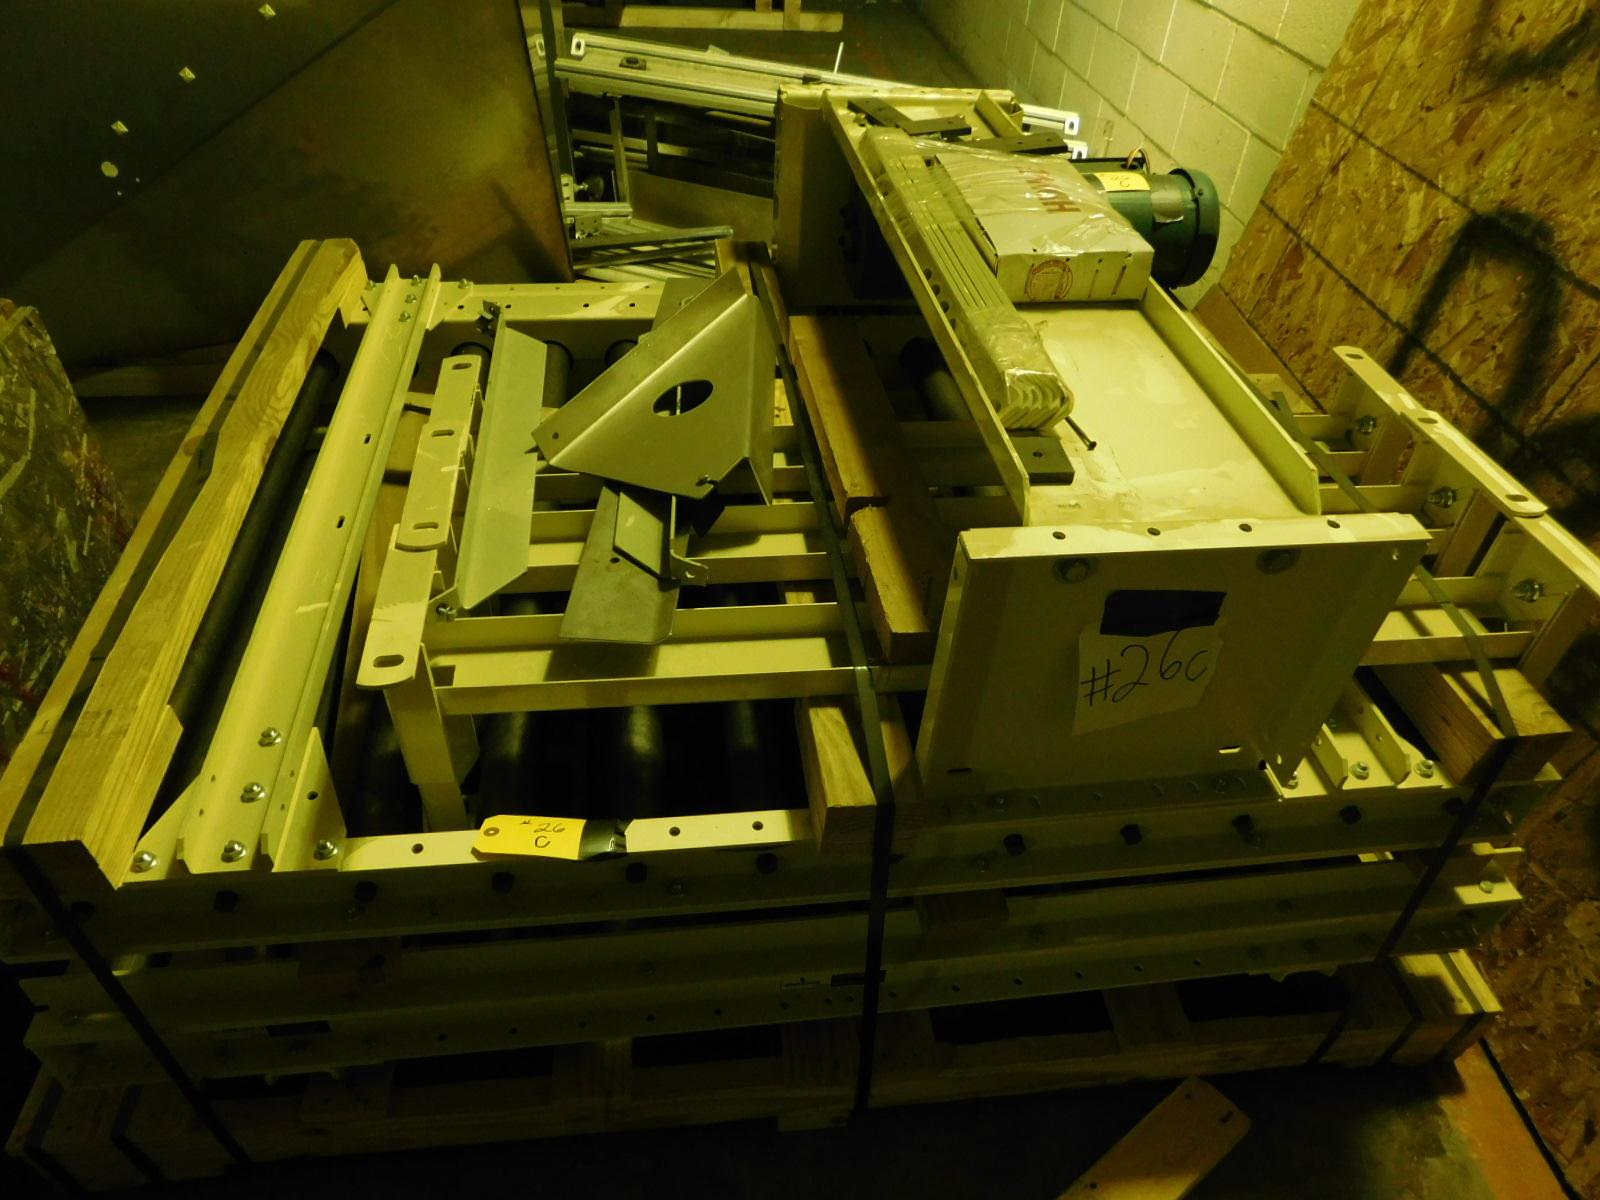 "Lot 26C - Hytrol Motorized conveyor EST.46 1/2""X60 1/4"" 460V, 3PHASE , TH EBACK CONVEYOR IN THE IMAGE IS NOT"